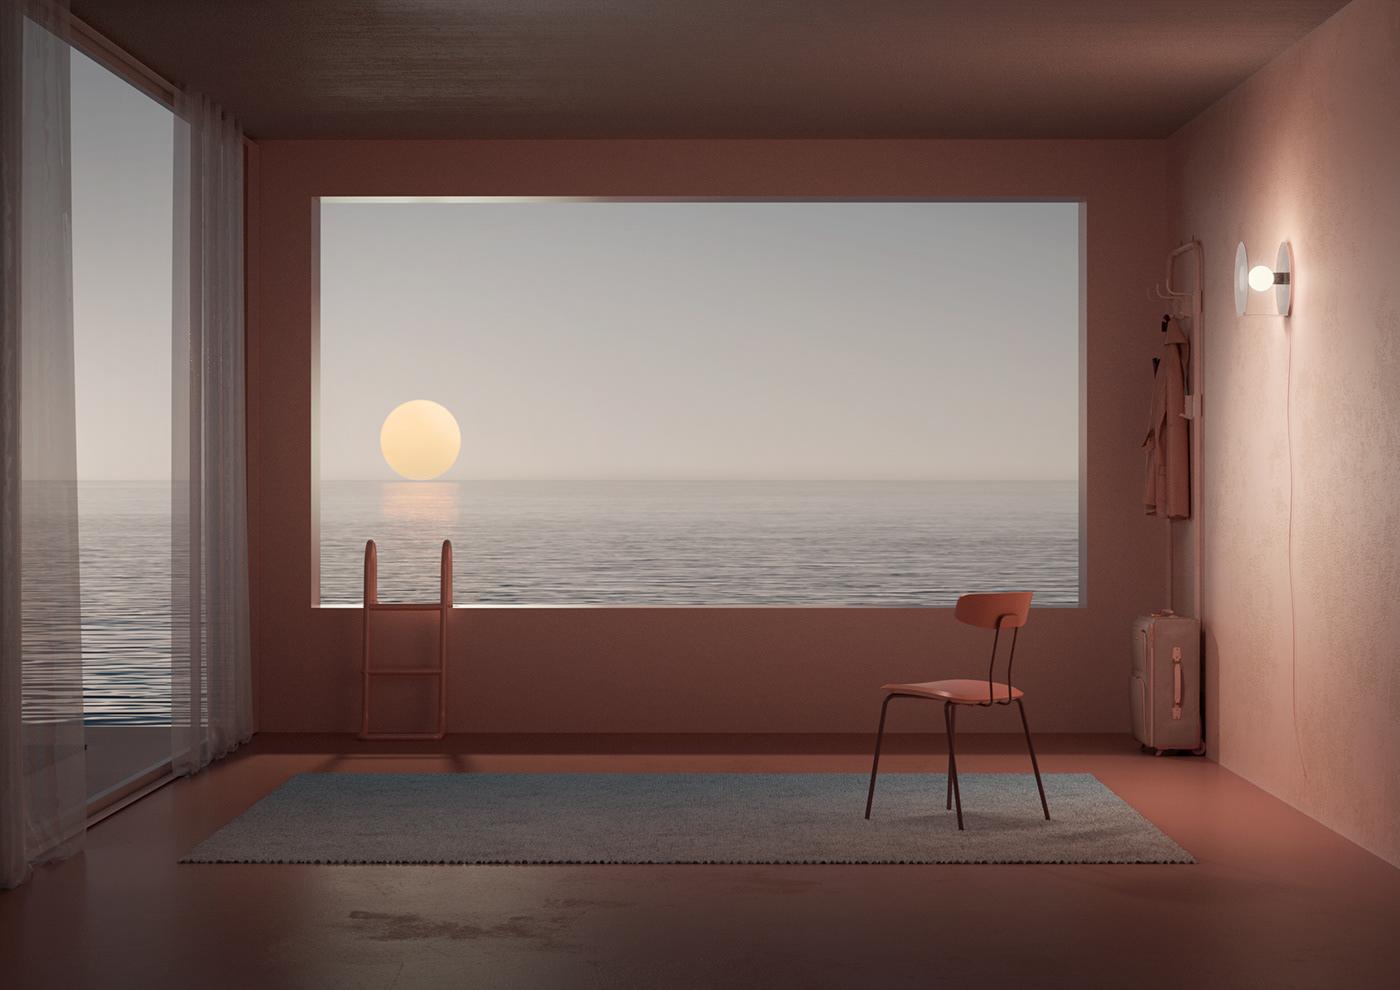 ATELIER AVEUS    Art Direction by Six N. Five, 3D Design by John Garcia Pons